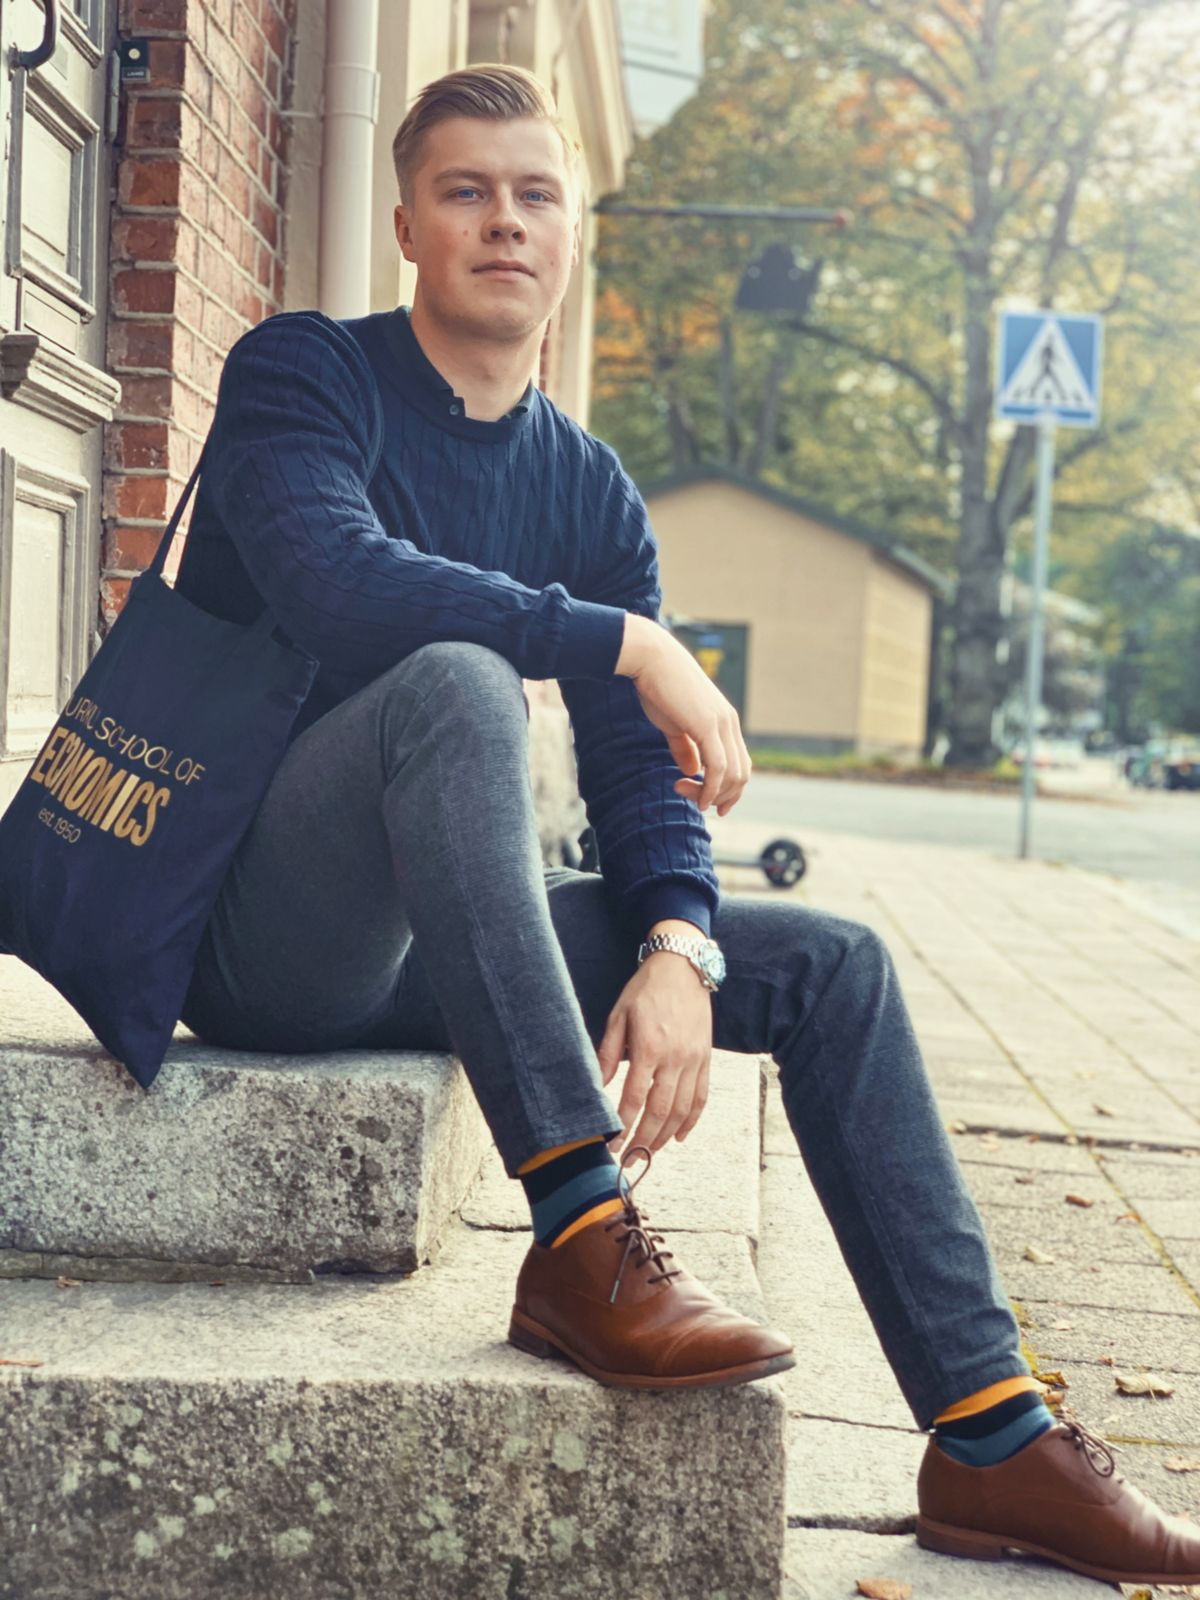 Droppe Hires Tuukka Strömberg as a Sales Representative, Droppe